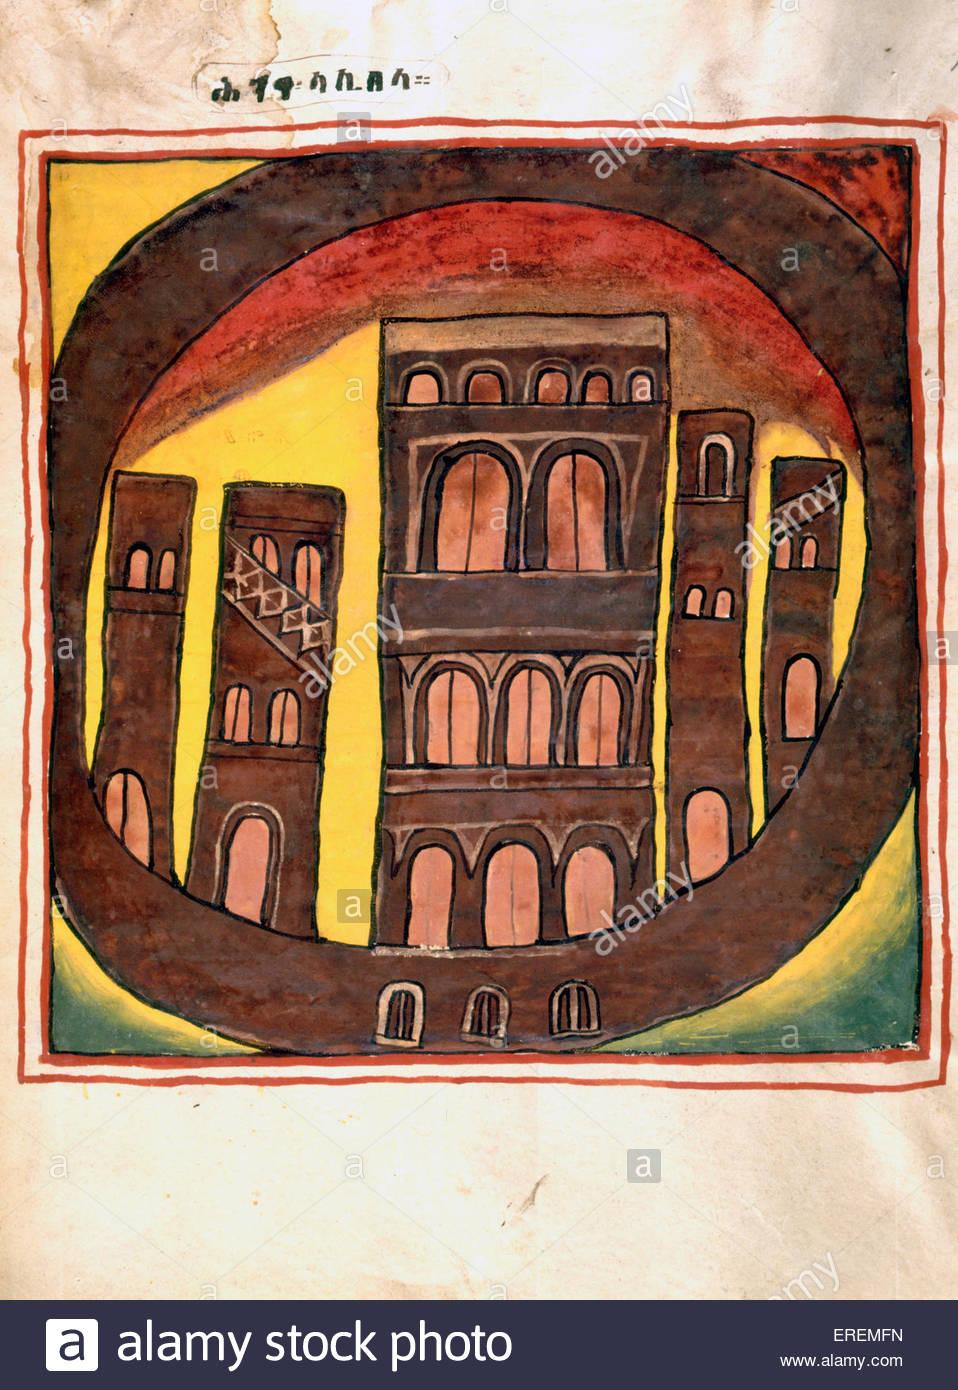 Los edificios de Lalibela, Etiopía. Siglo xix manuscrito iluminado. Posiblemente desde el Qwuesqwam Quesquam Imagen De Stock